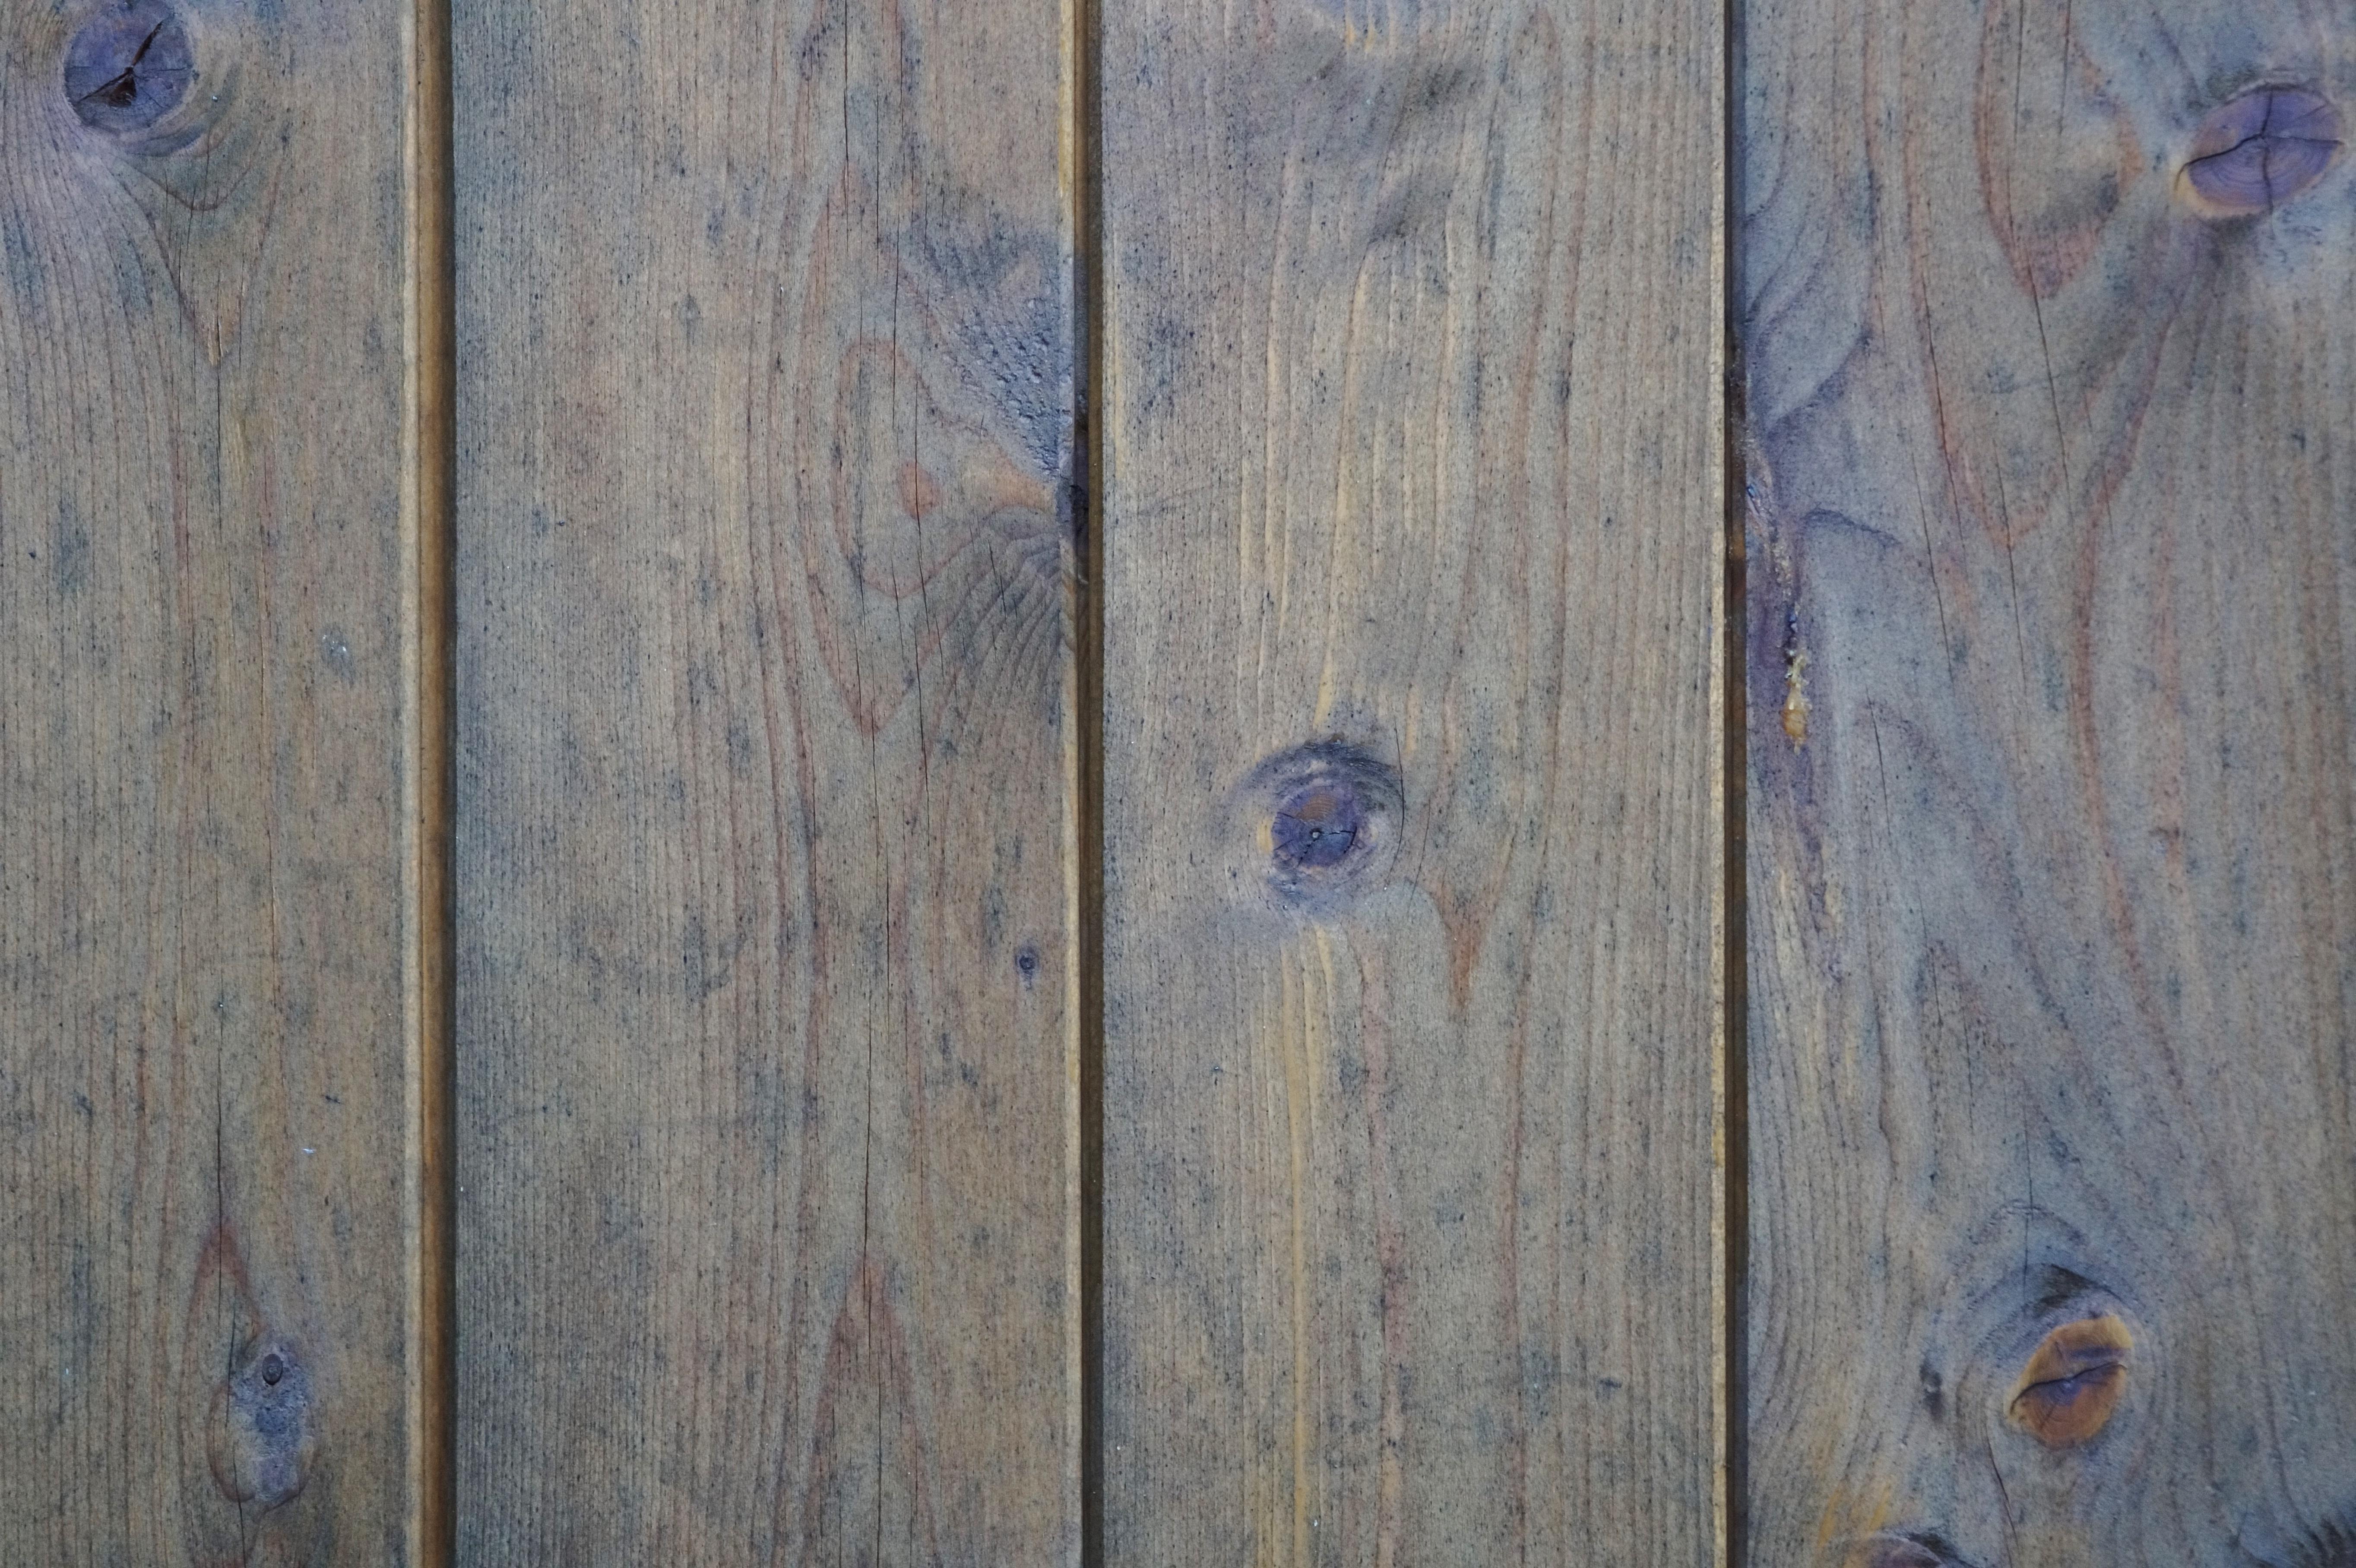 hintergrund hartholz bretter privatsphre holzwand holzzaun holzbretter wandbretter bodenbelag holzboden mann machte objekt laminatboden - Hartholz Oder Laminatboden